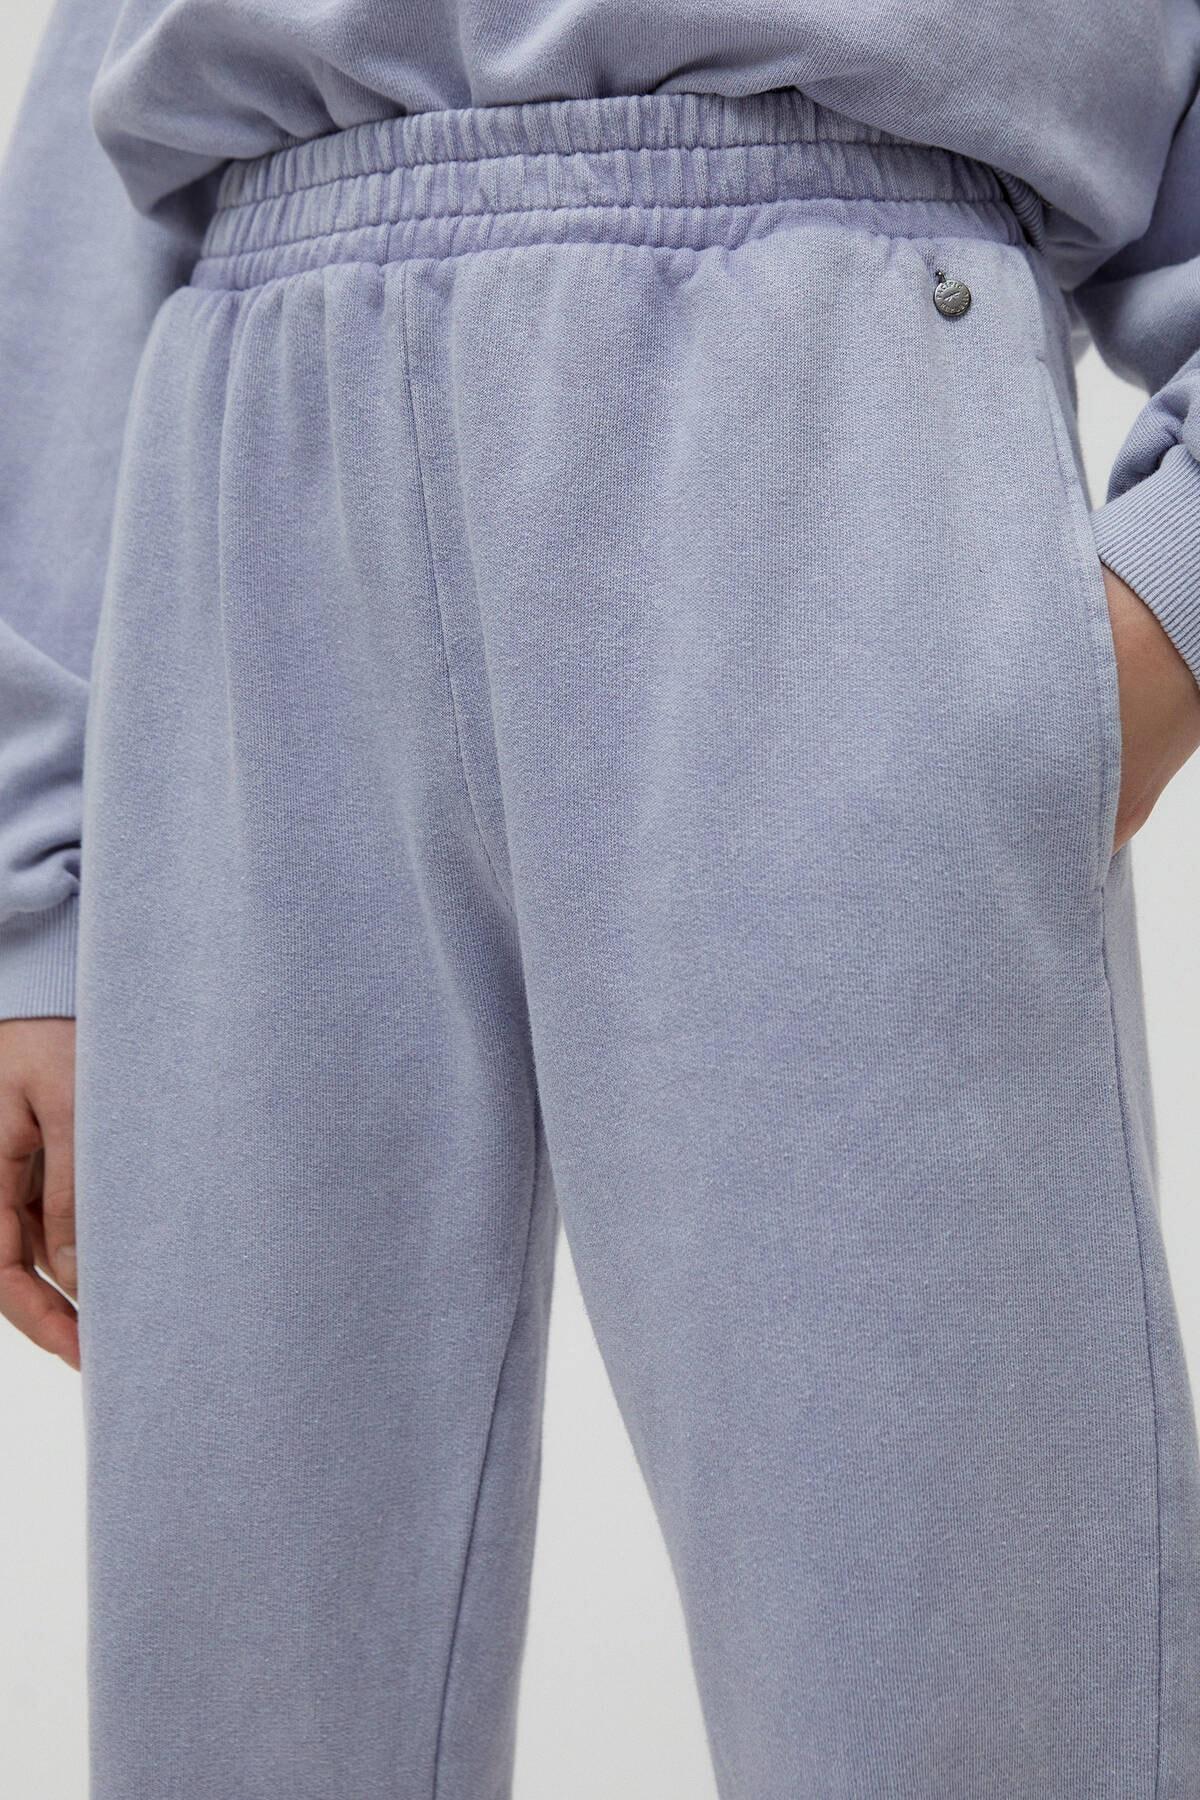 Pull & Bear Kadın Küllü Gri Hawaii Sloganlı Jogging Fit Pantolon 04677302 4